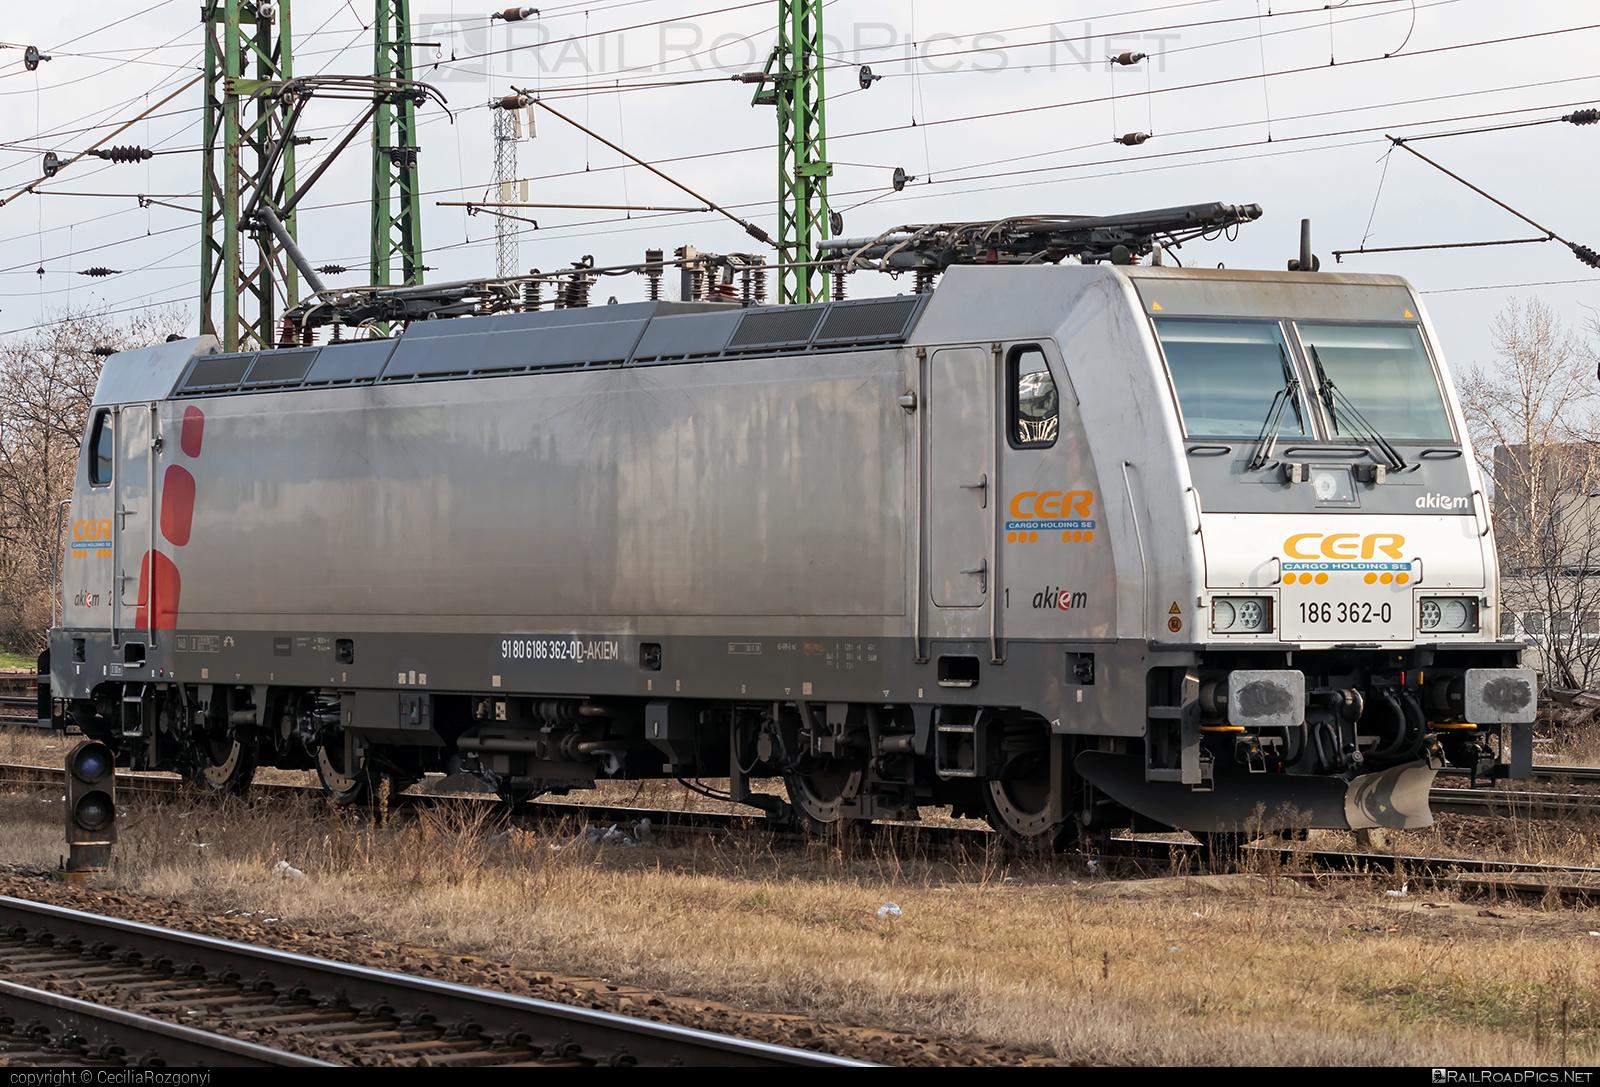 Bombardier TRAXX F140 MS - 186 362-0 operated by Central-European Railway AG. #akiem #akiemsas #bombardier #bombardiertraxx #cer #traxx #traxxf140 #traxxf140ms